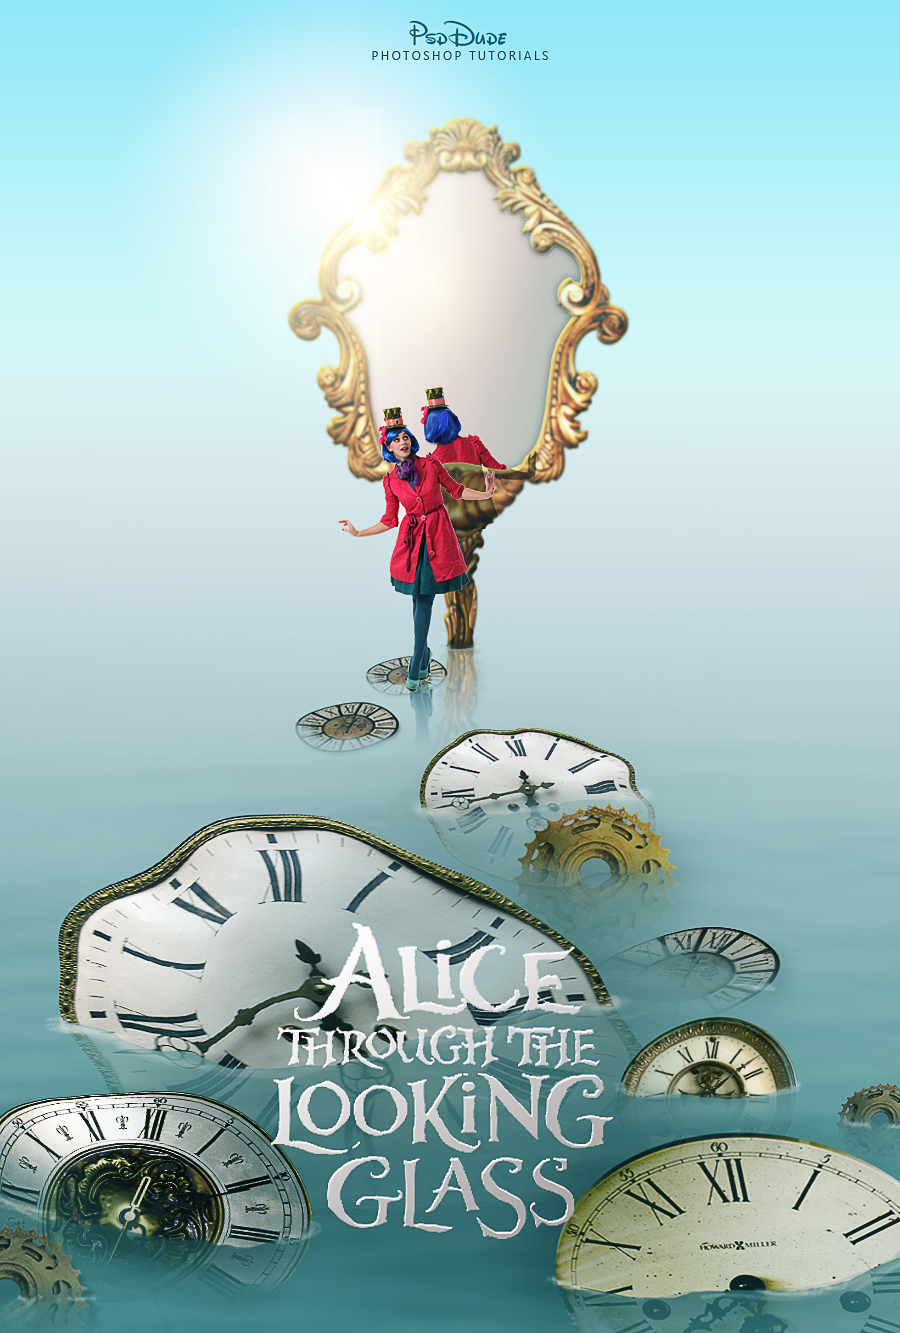 Alice Through the Looking Glass Photoshop Tutorial - Photoshop tutorial | PSDDude